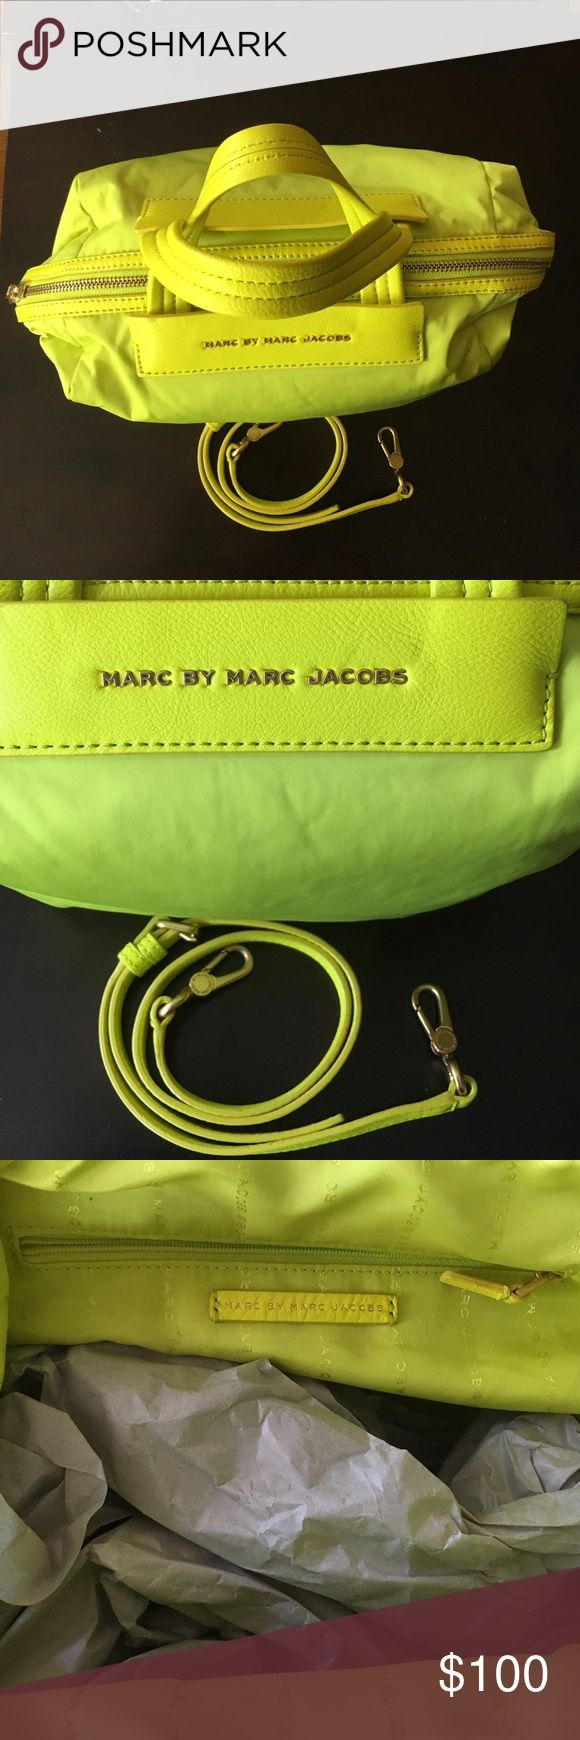 Nylon & Leather Marc by Marc Jacobs Bag Authentic Neon Yellow Medium Nylon & Leather Marc by Marc Jacob Bag. Used twice Like new.. No damage. Detachable strap. Gold tone hardware, inside pocket. (Won't last long) Marc by Marc Jacobs Bags Shoulder Bags